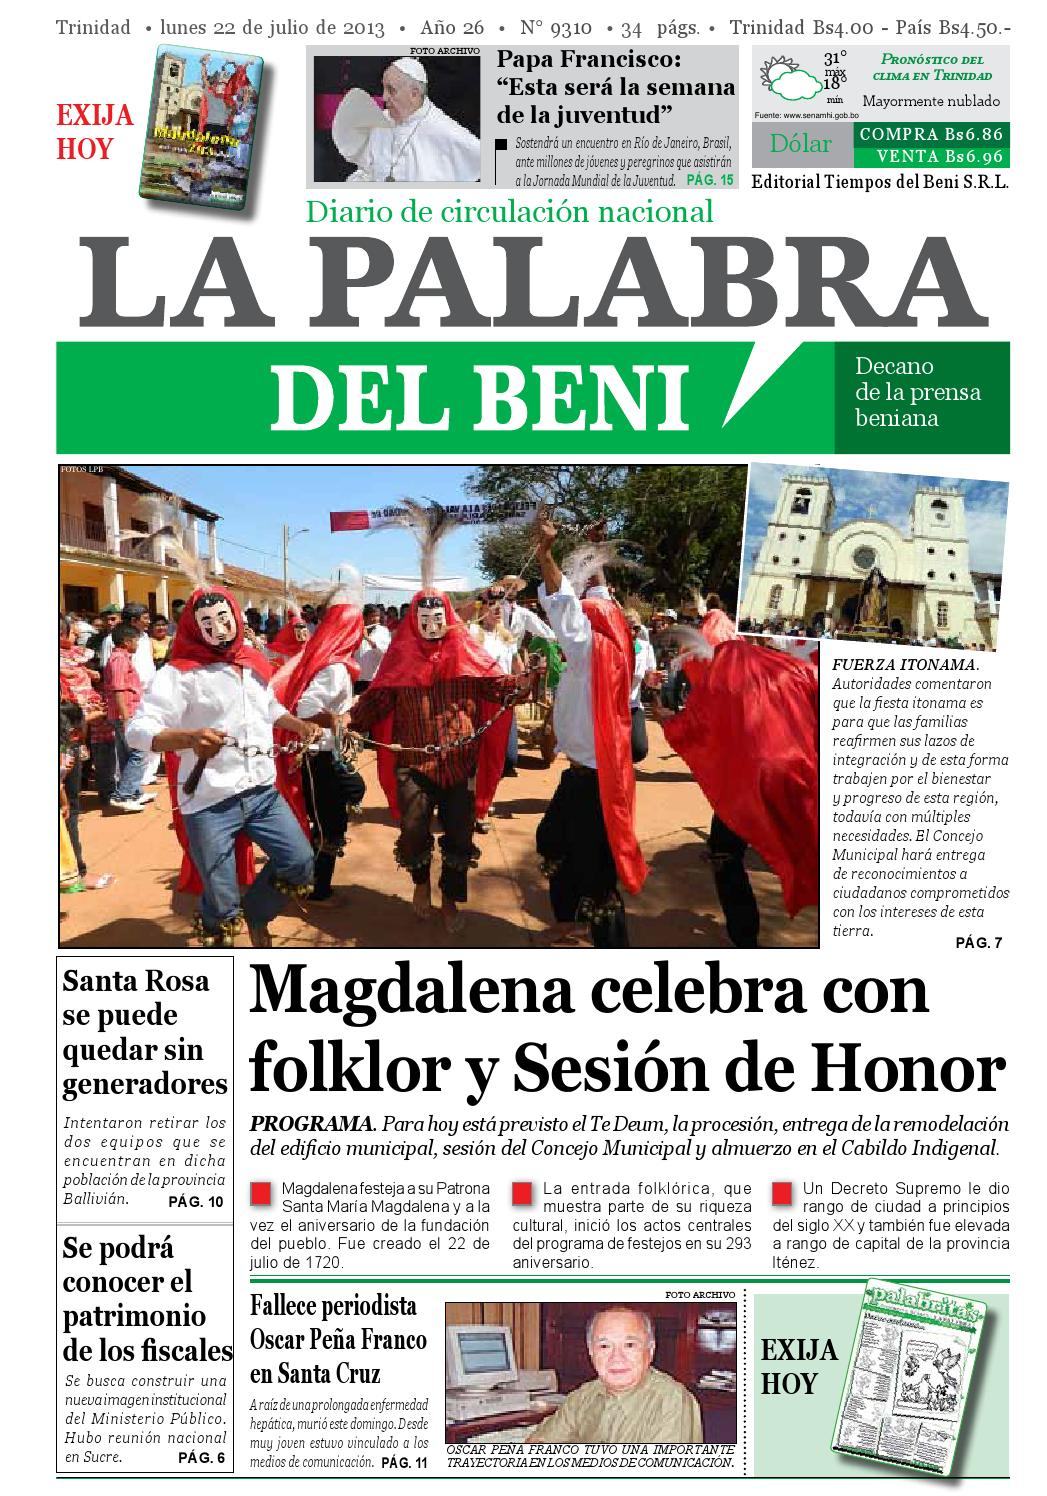 La Palabra del Beni, 22 de Julio de 2013 by La Palabra del Beni - issuu